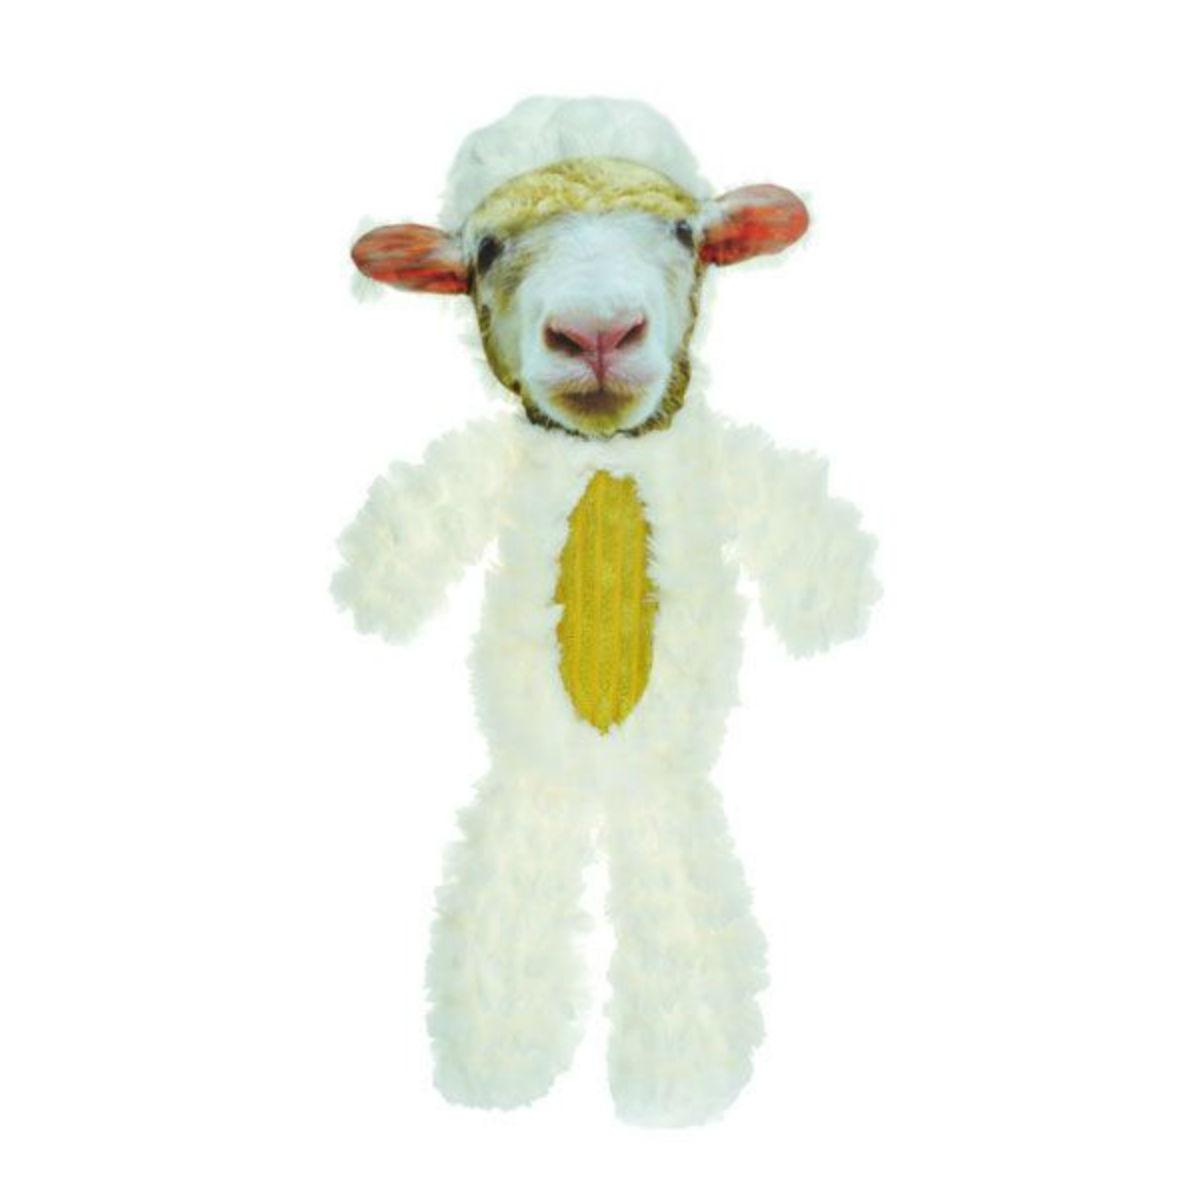 FurRealz Full Body Flattie Dog Toy - Sheep